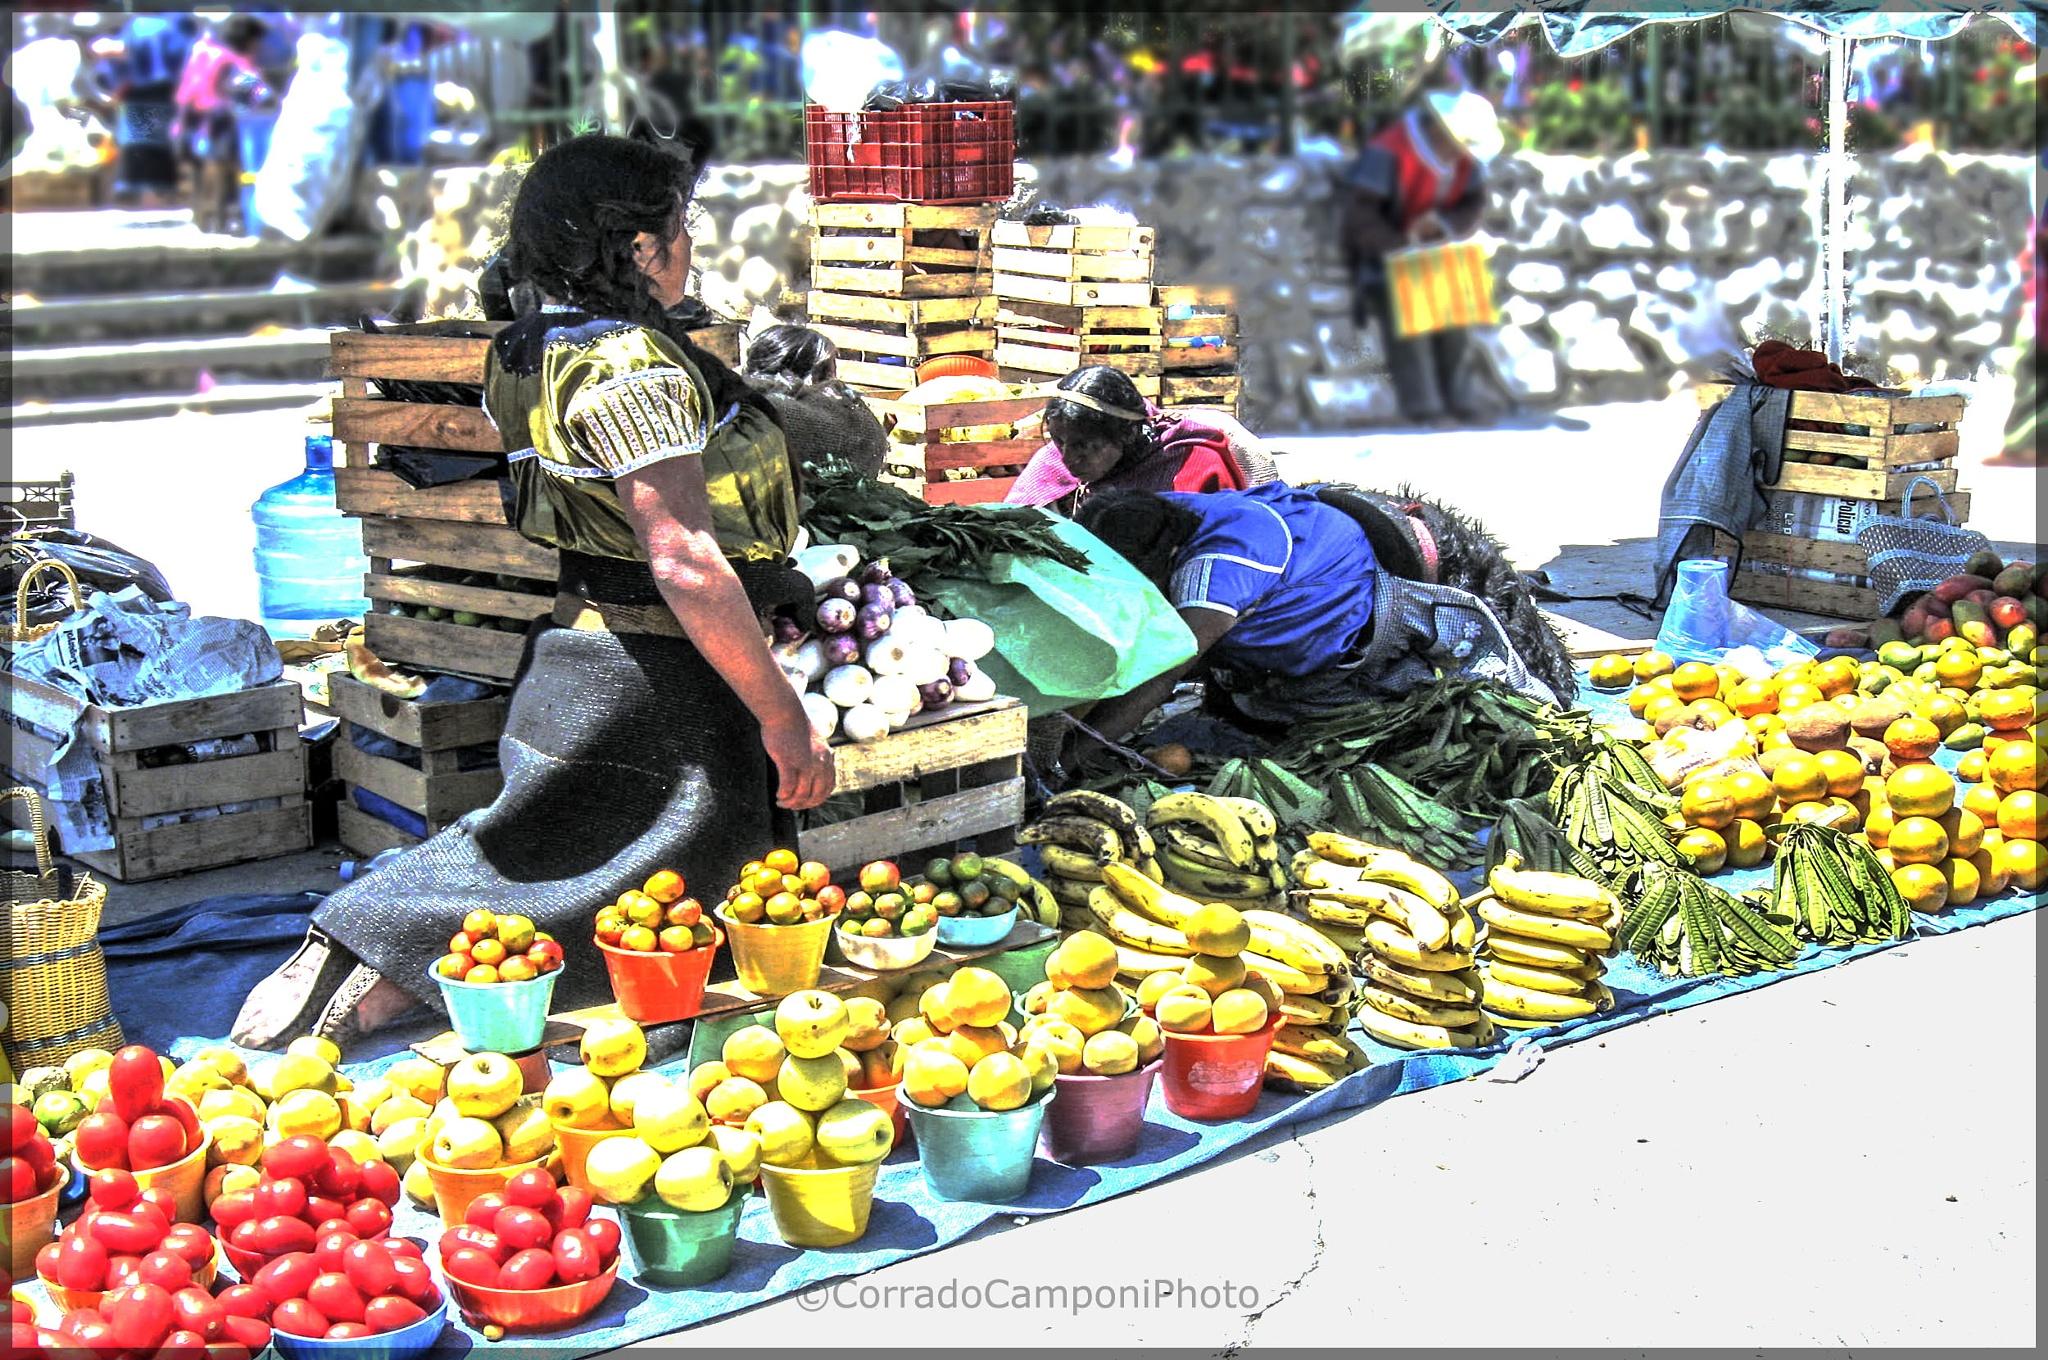 street market by corradocamponiphoto